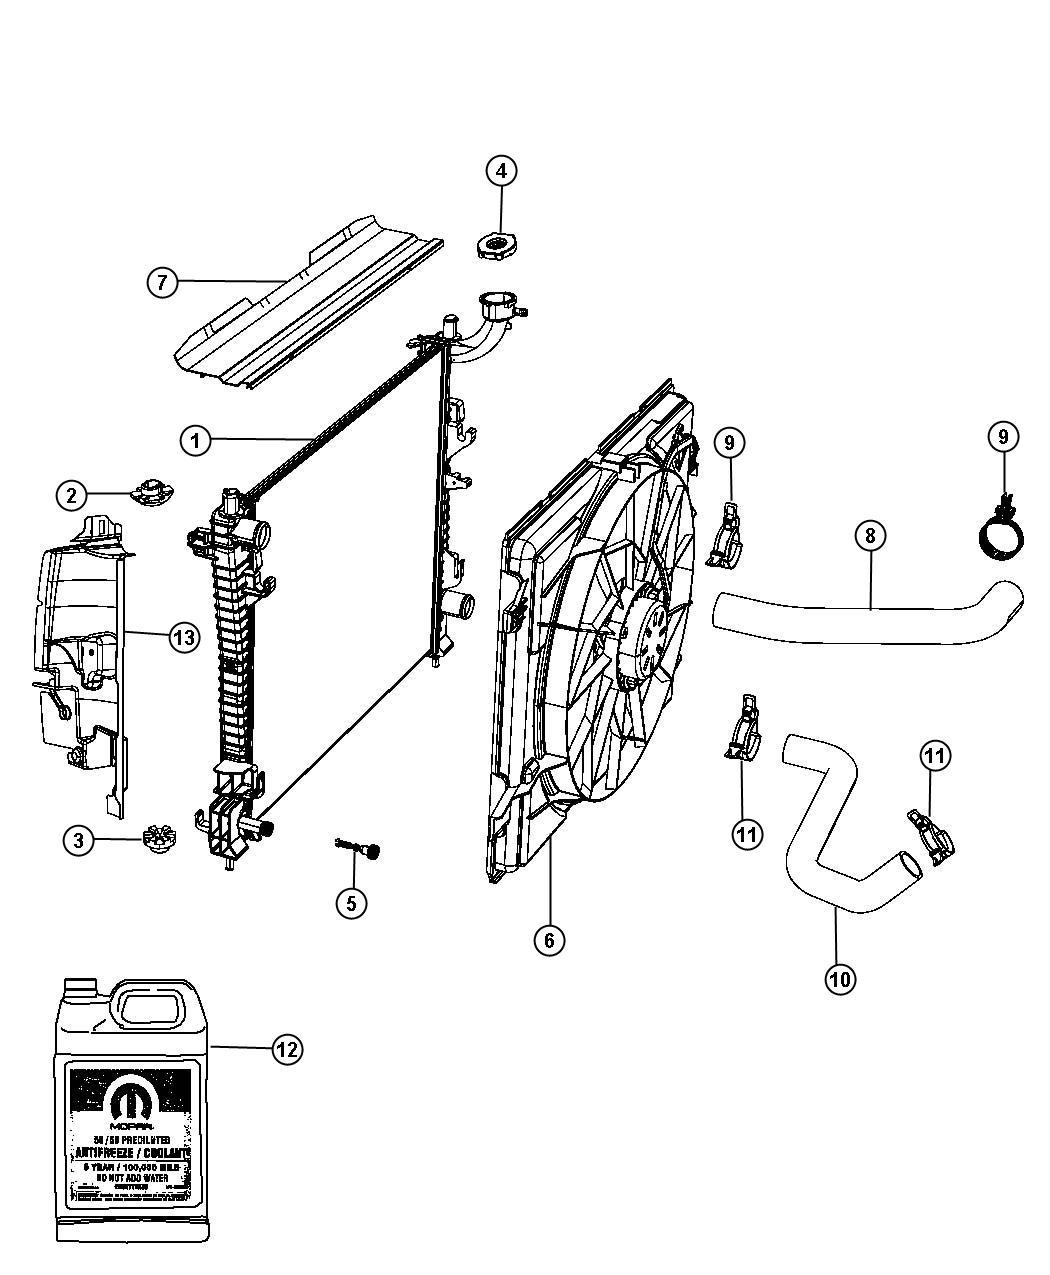 Jeep Grand Cherokee Draincock Radiator Export